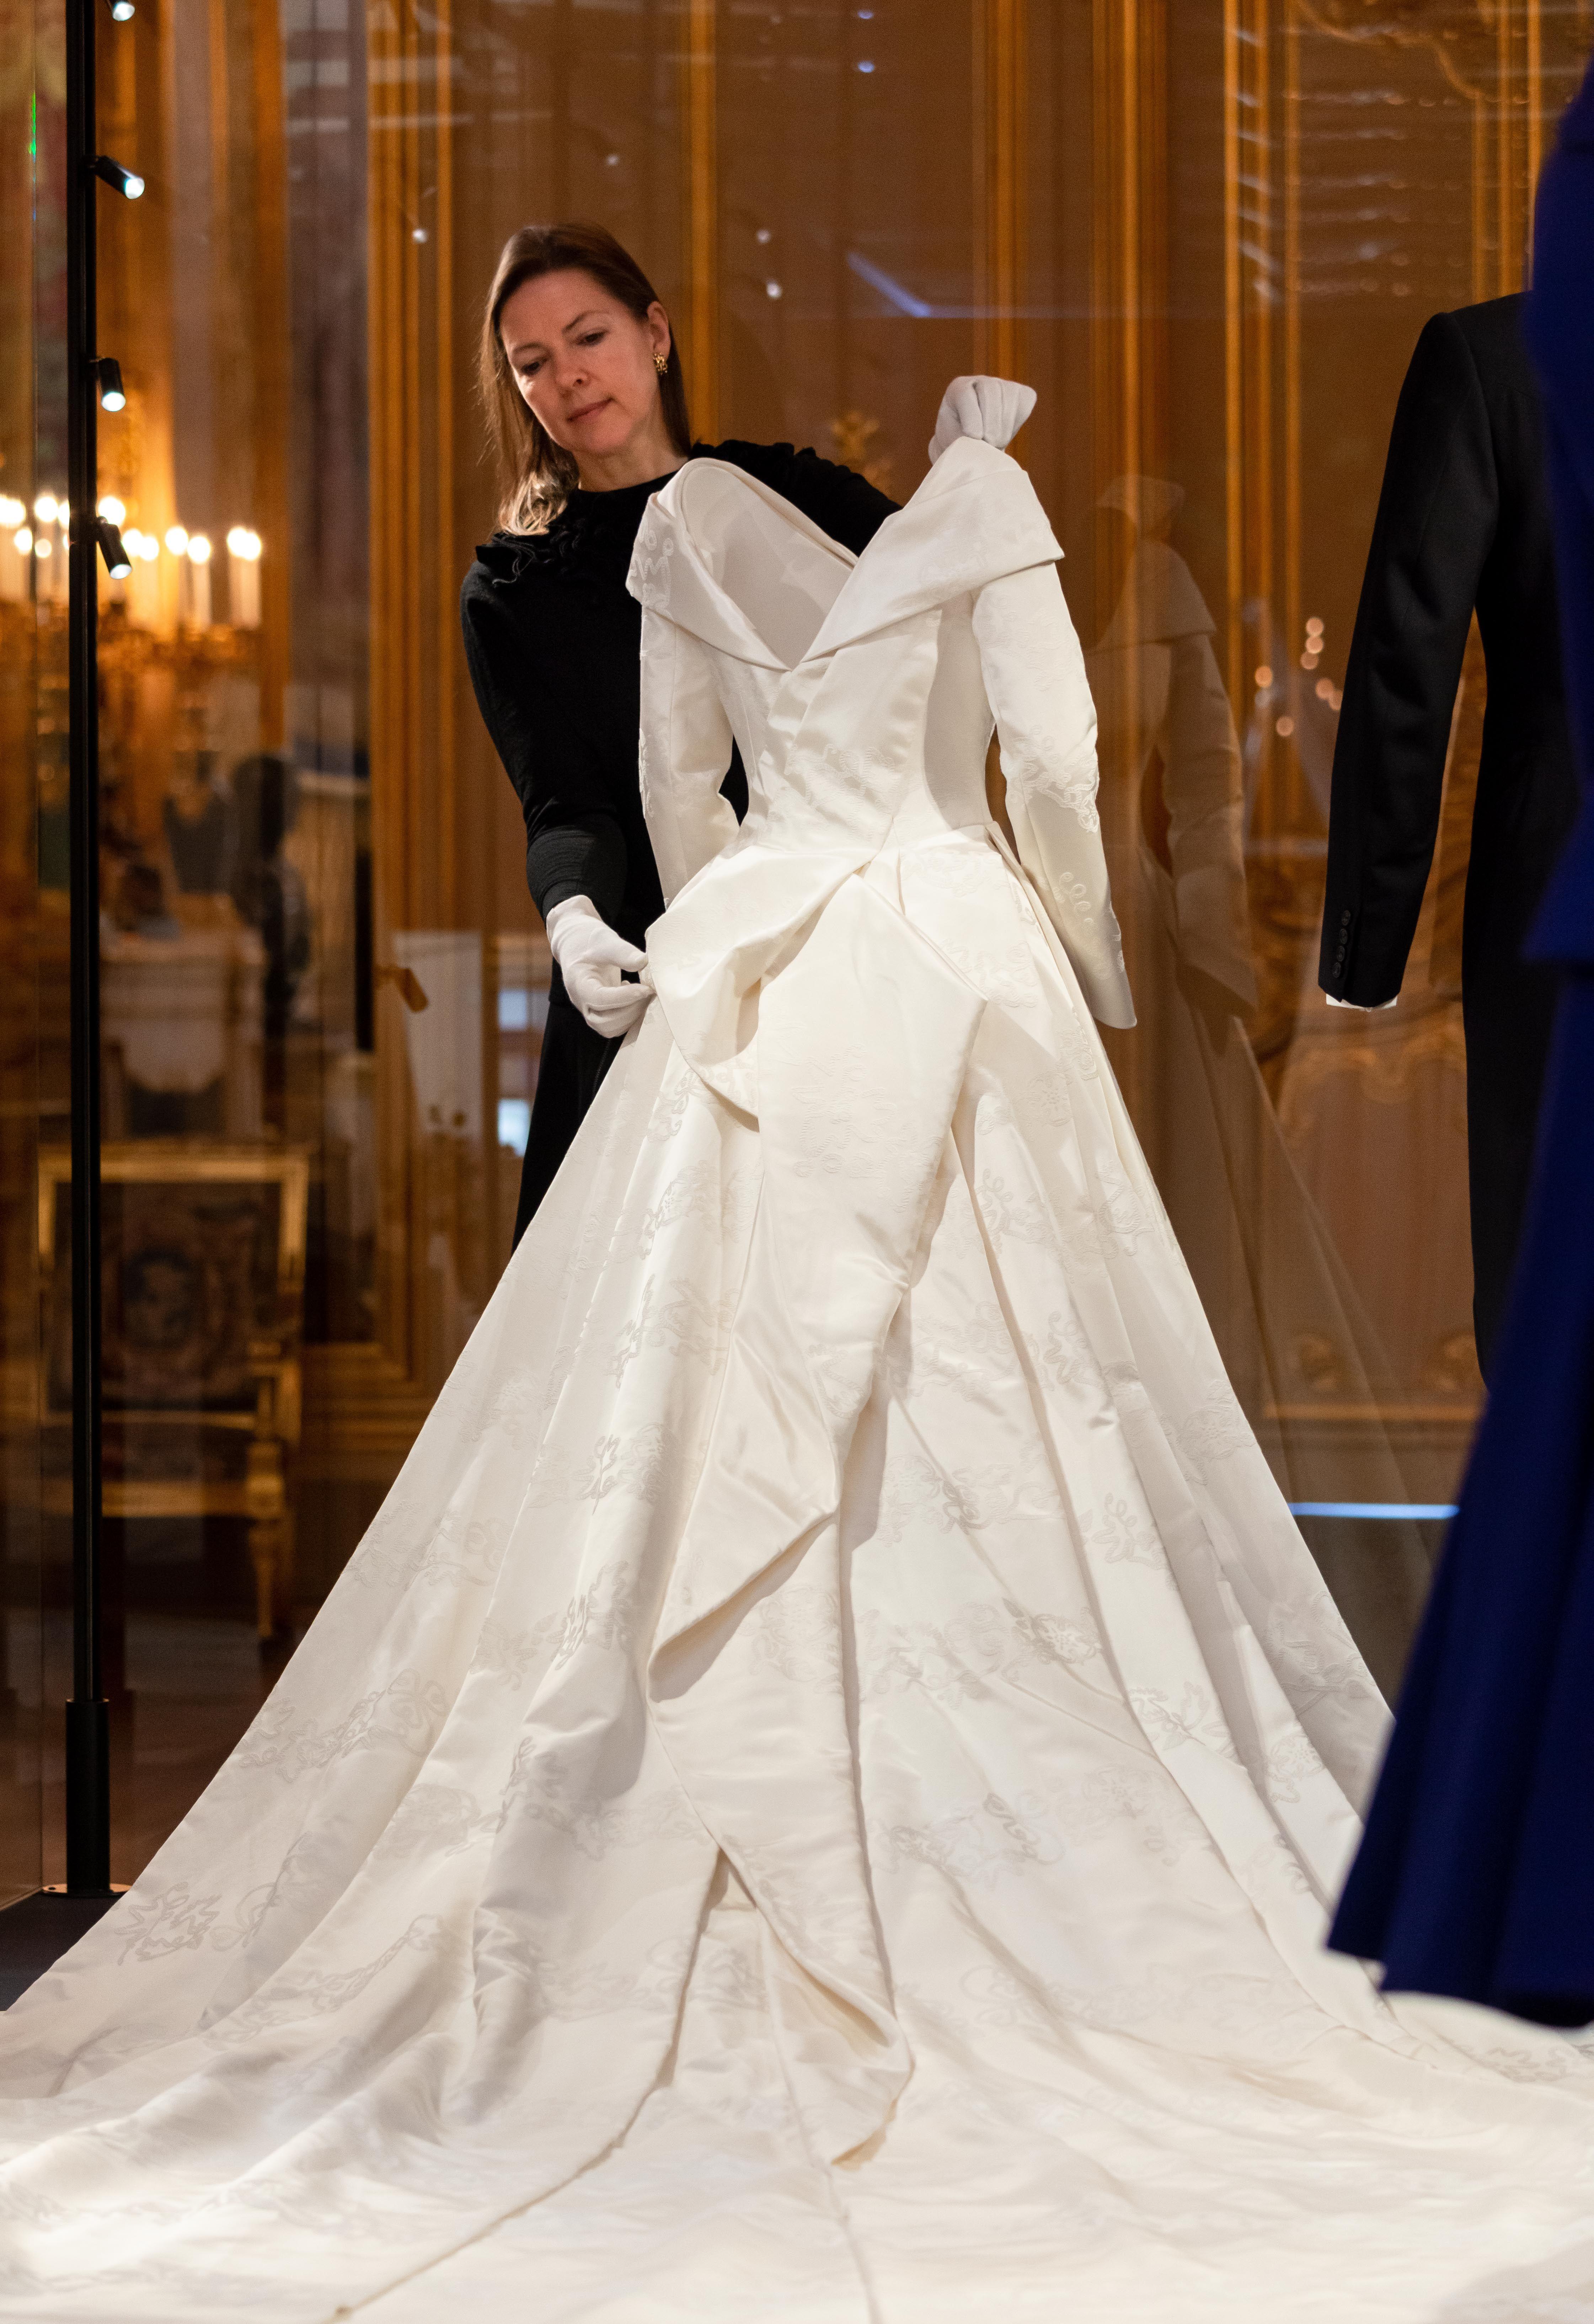 A New Royal Wedding Exhibition At Windsor Castle Royal Wedding Gowns Wedding Dresses Royal Wedding Dress [ 6537 x 4484 Pixel ]